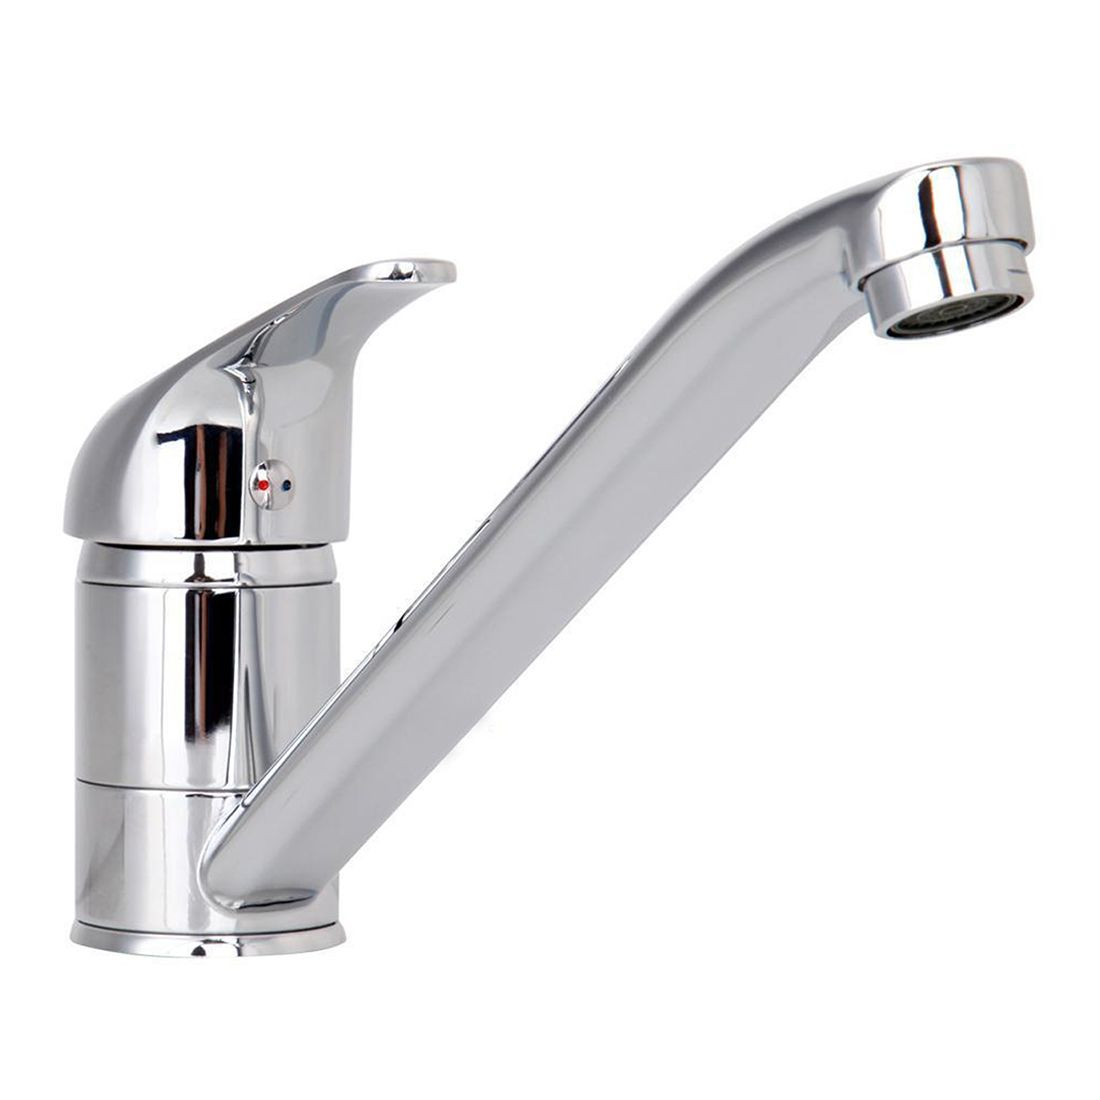 Waterfall Faucet Wash Basin Faucet Wash Basin Mixer Faucet Type ...